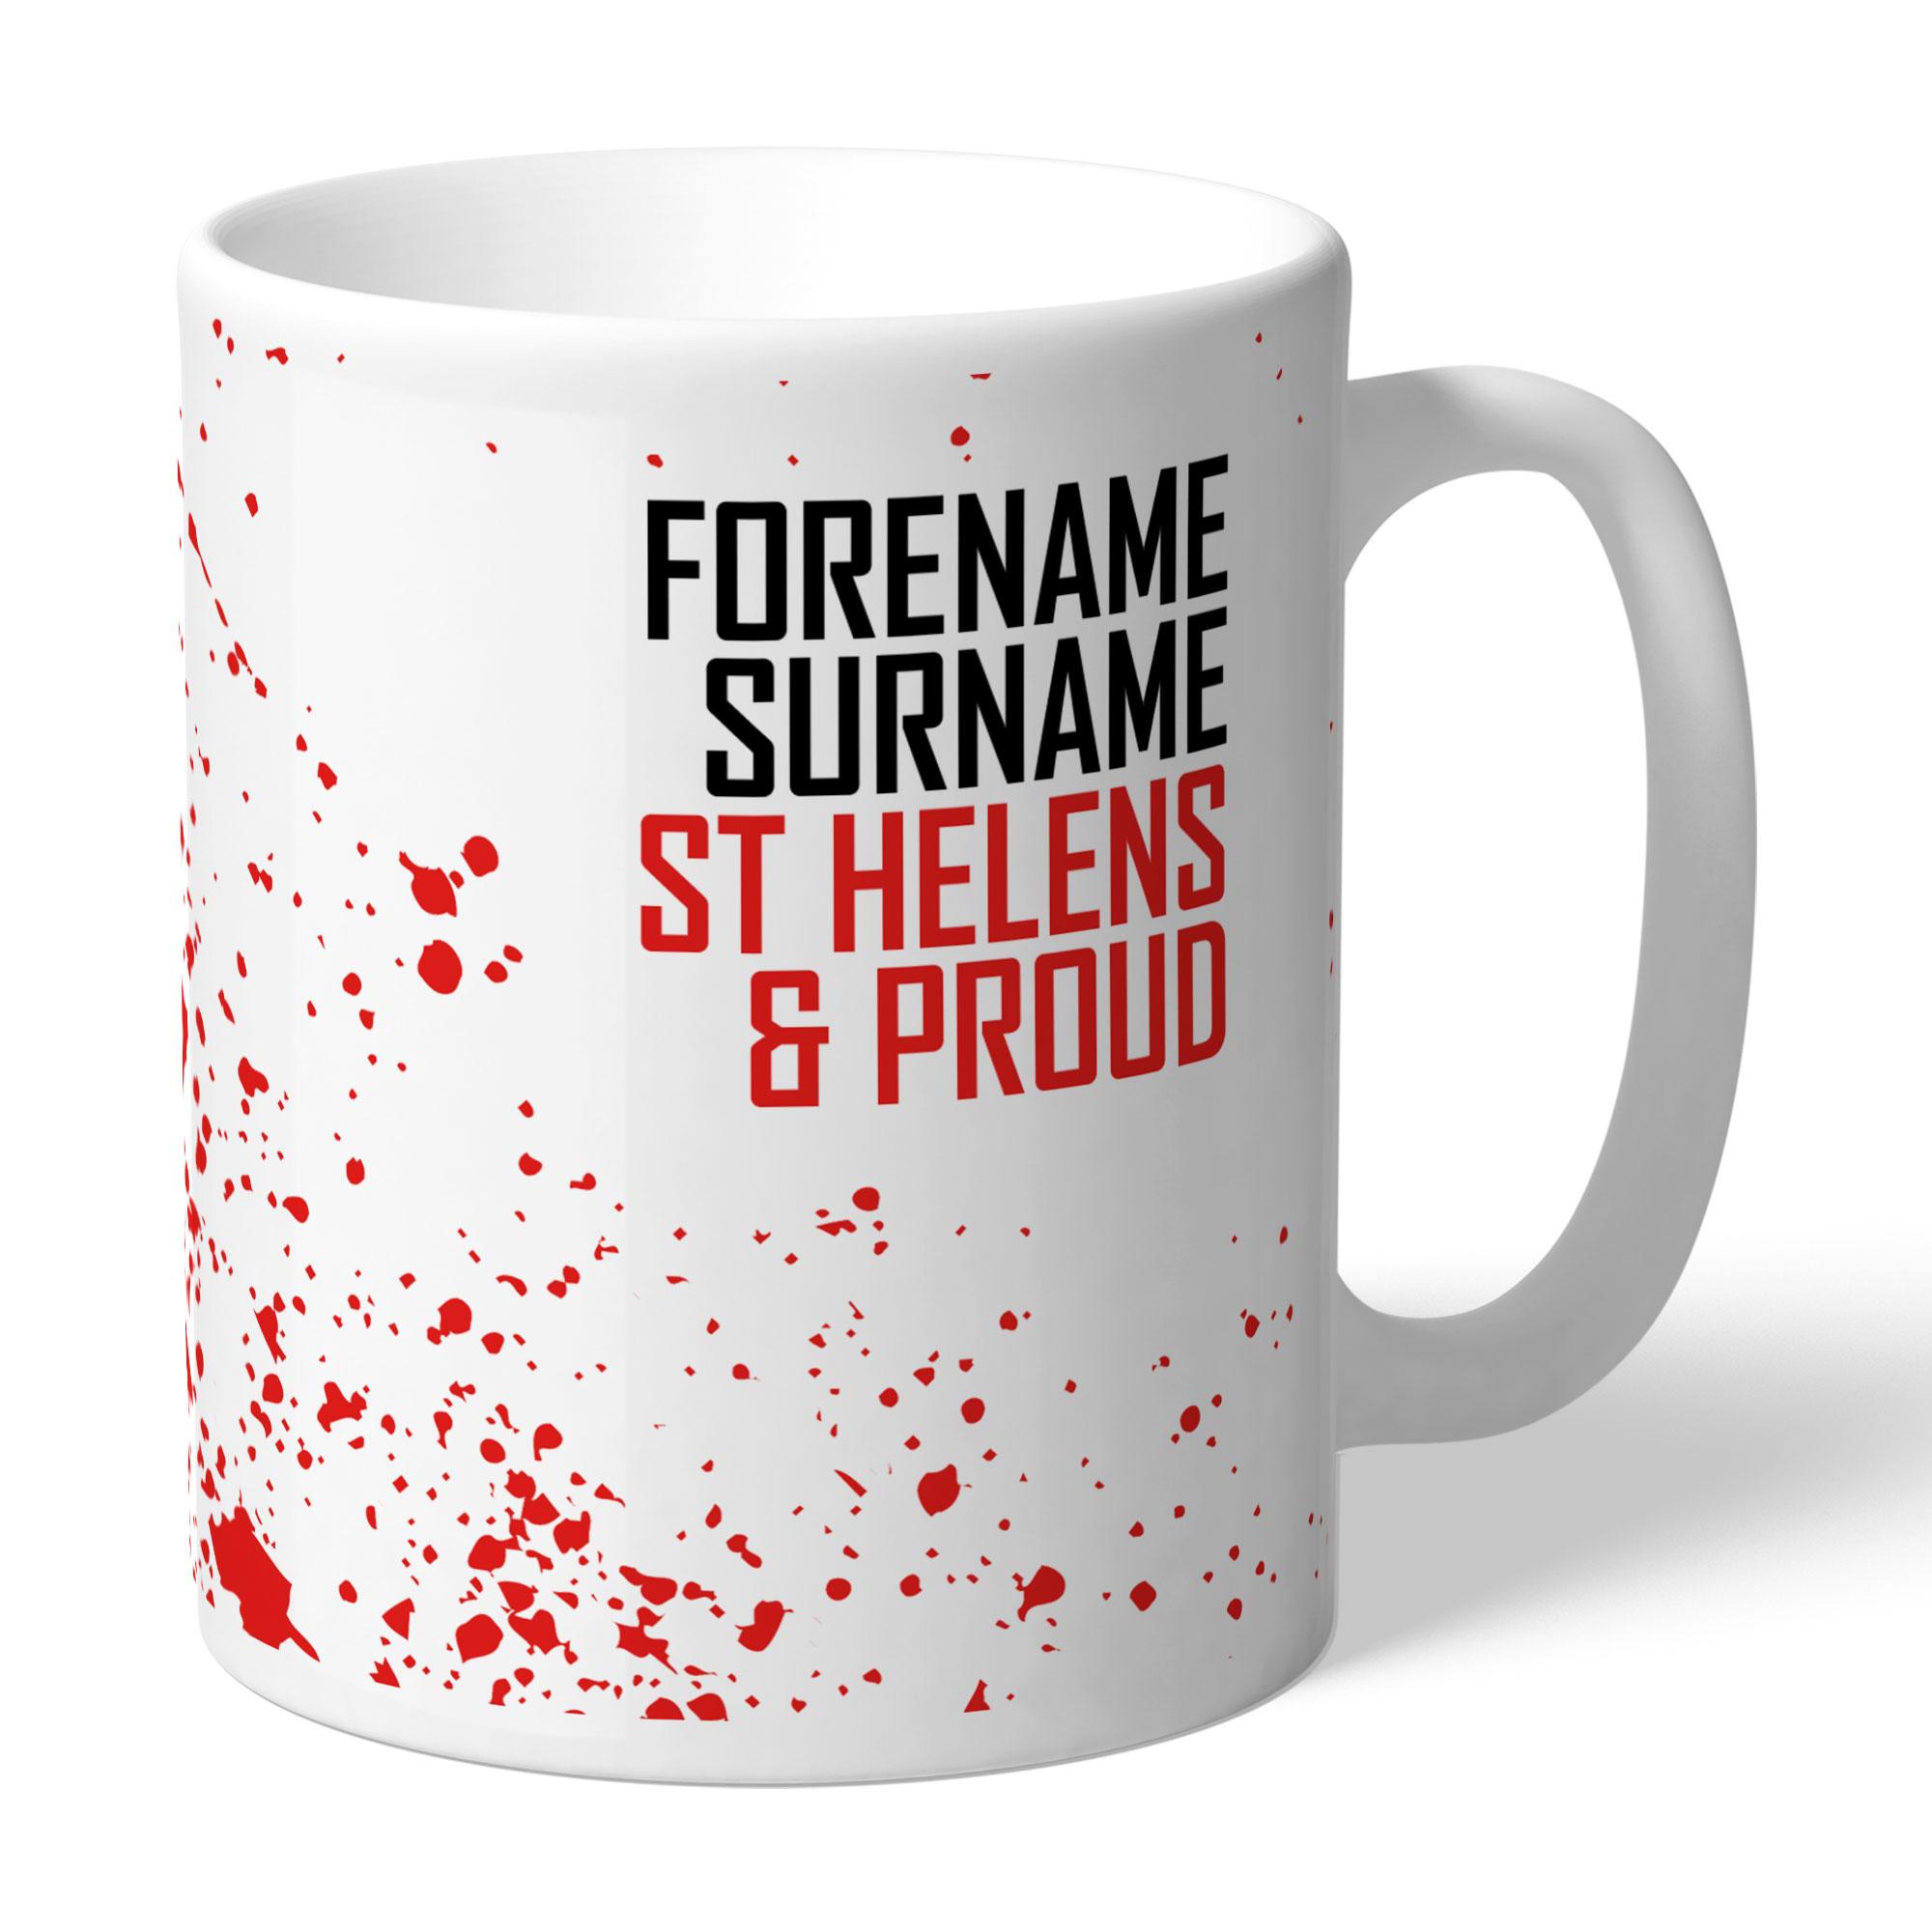 St Helens Proud Mug